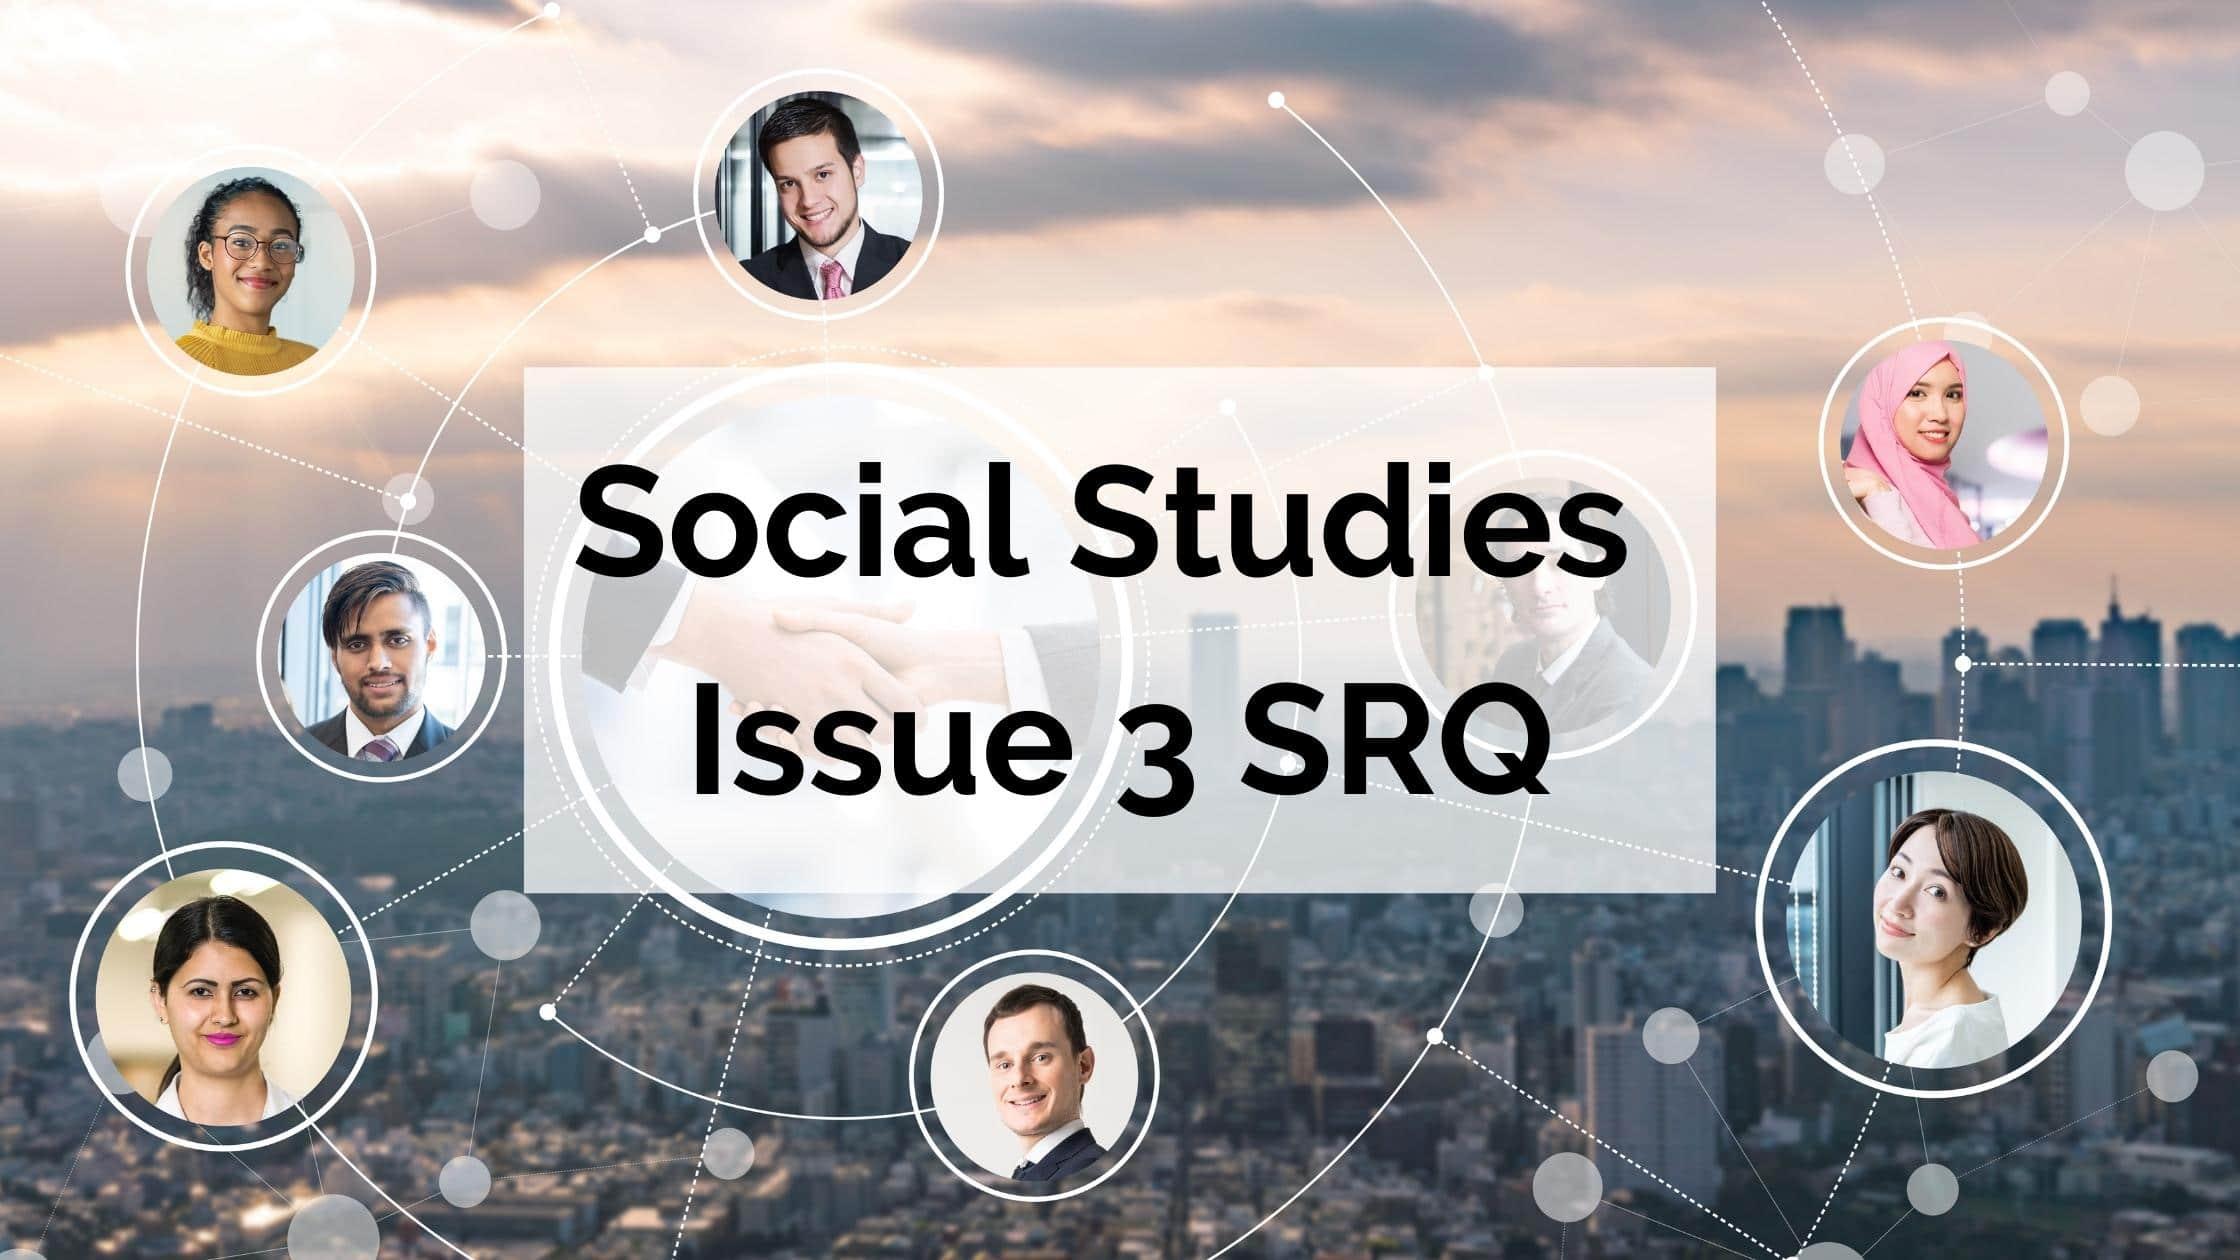 Social Studies Issue 3